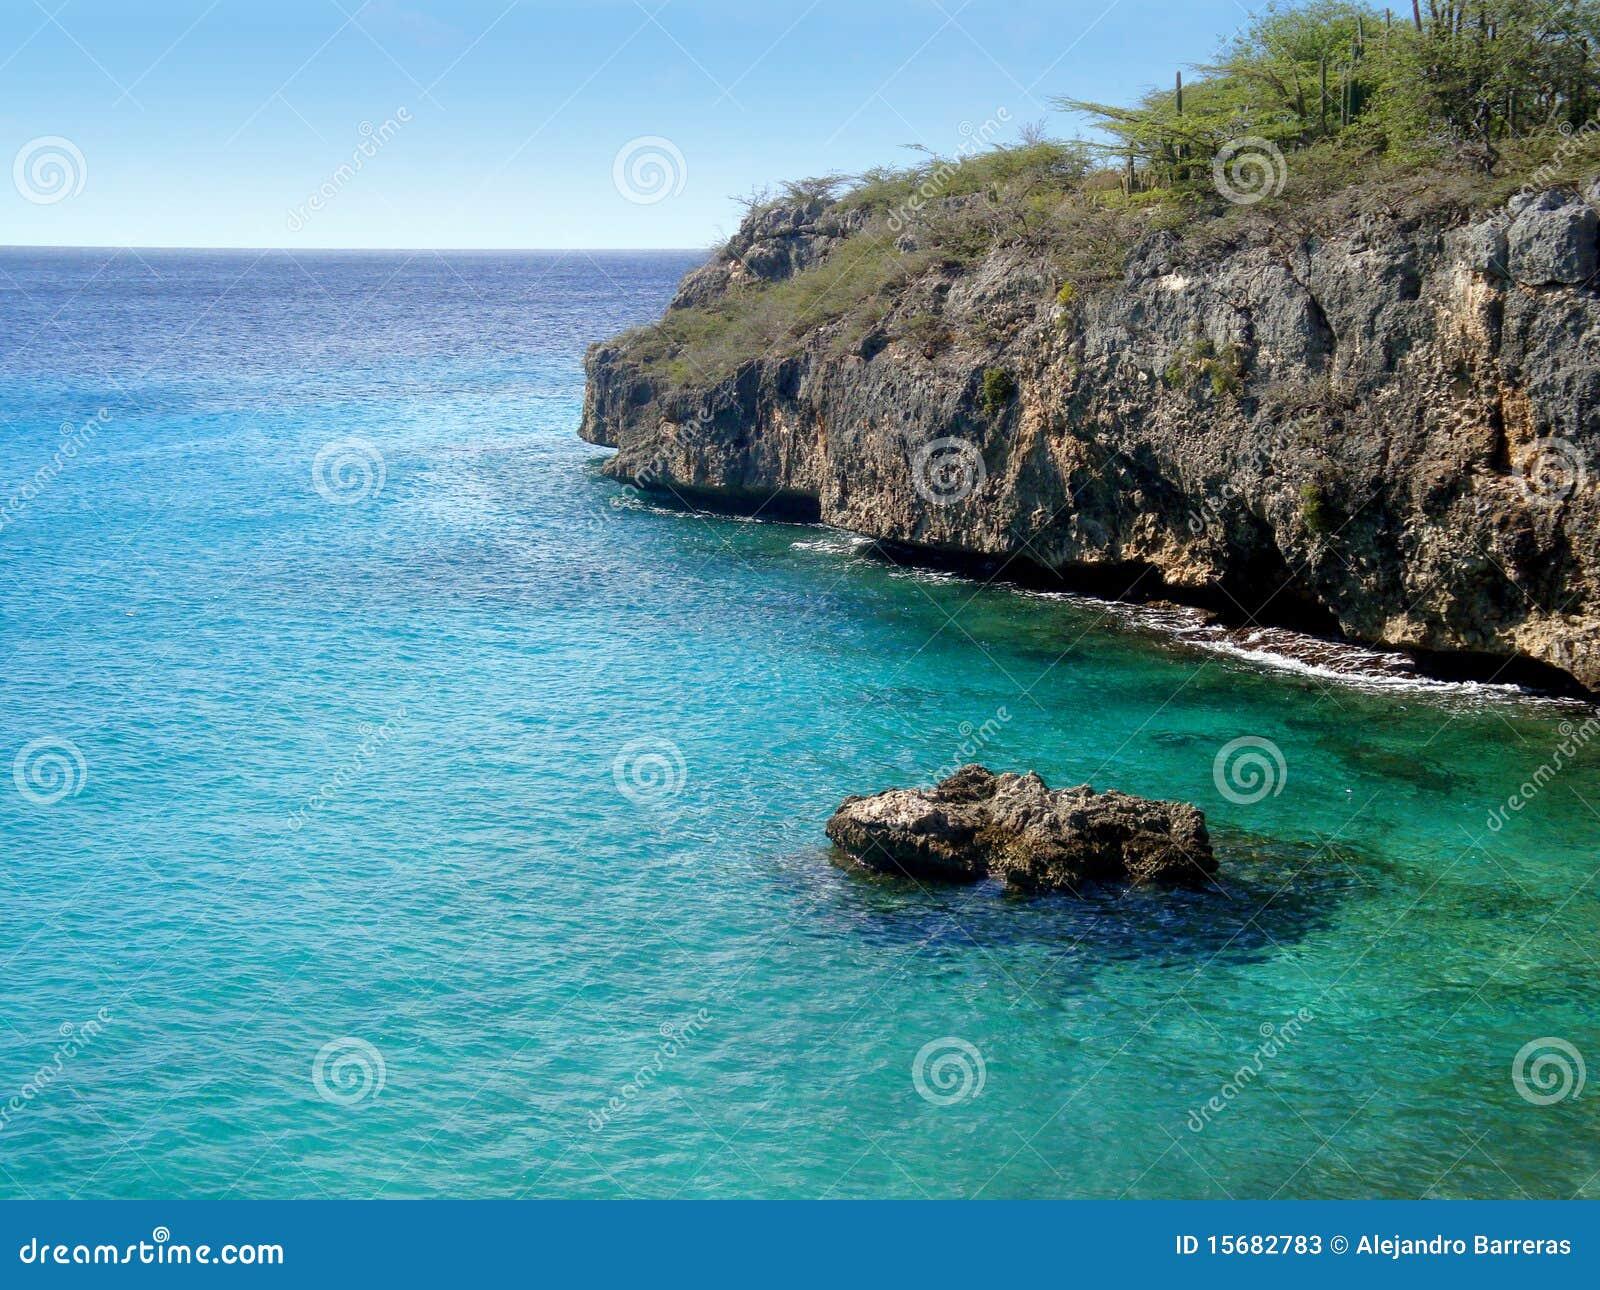 Playa Jeremi in Curacao